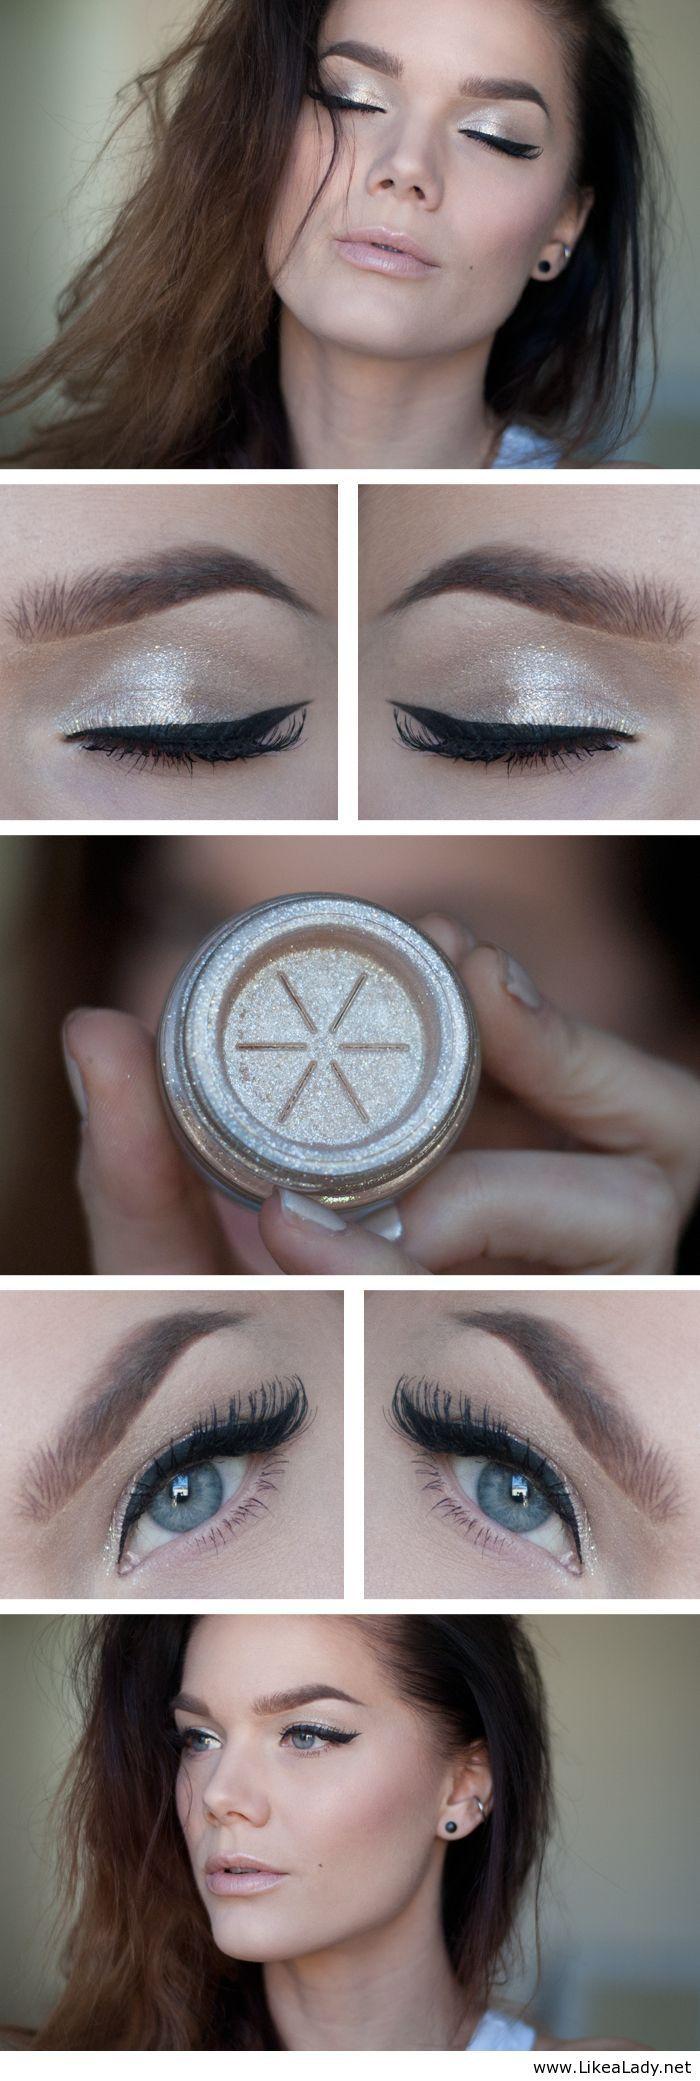 Sliver white makeup